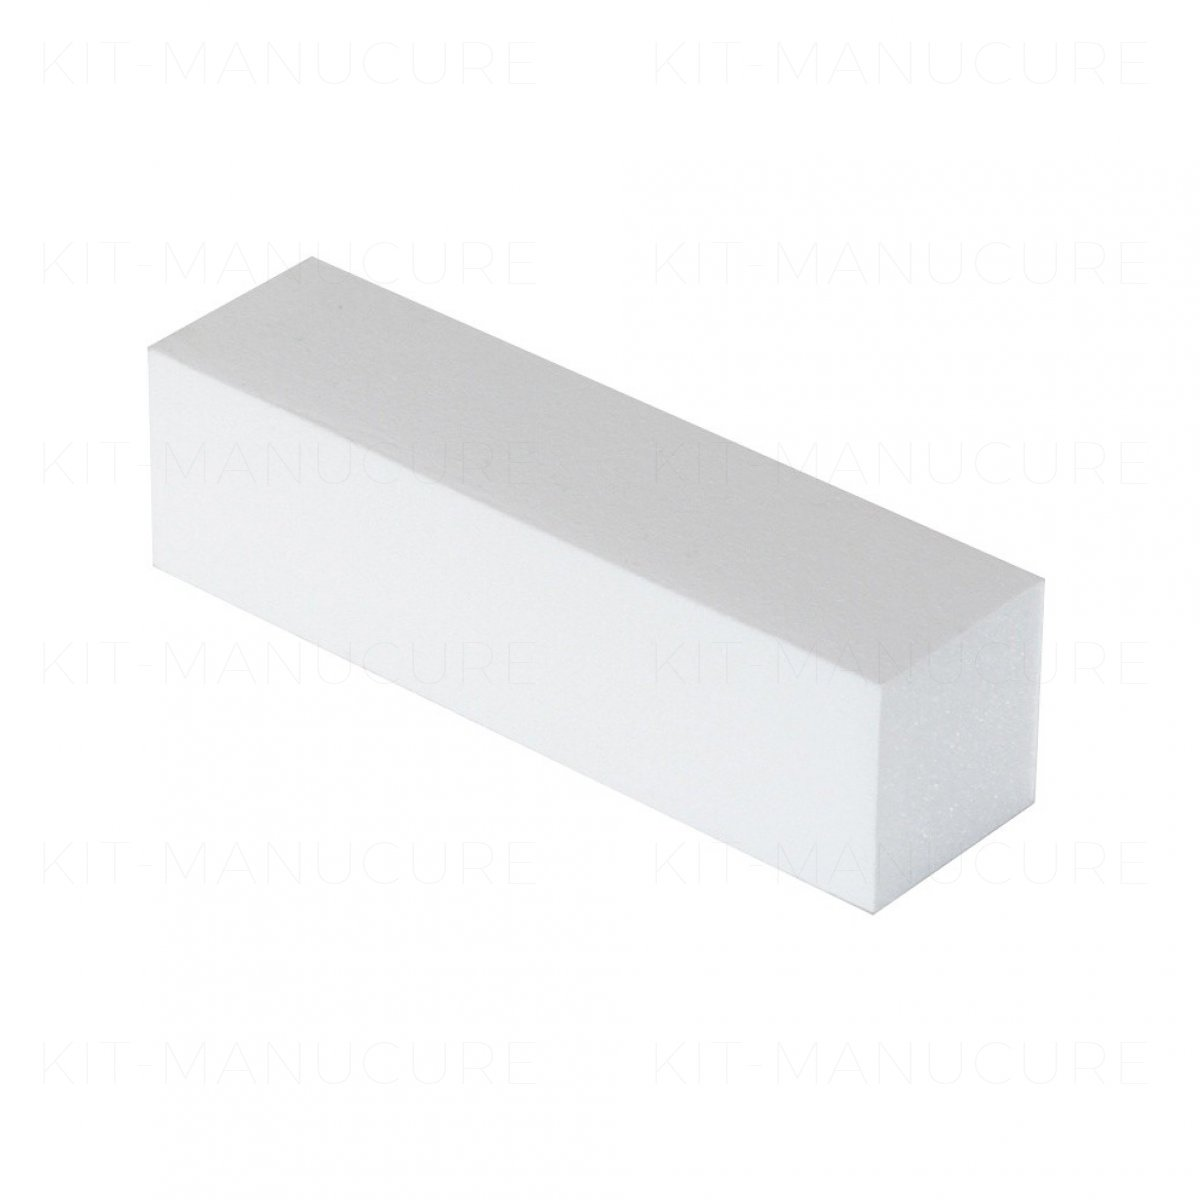 https://www.kit-manucure.com/347-thickbox_default/bloc-blanc-polissoir-grain-240240.jpg